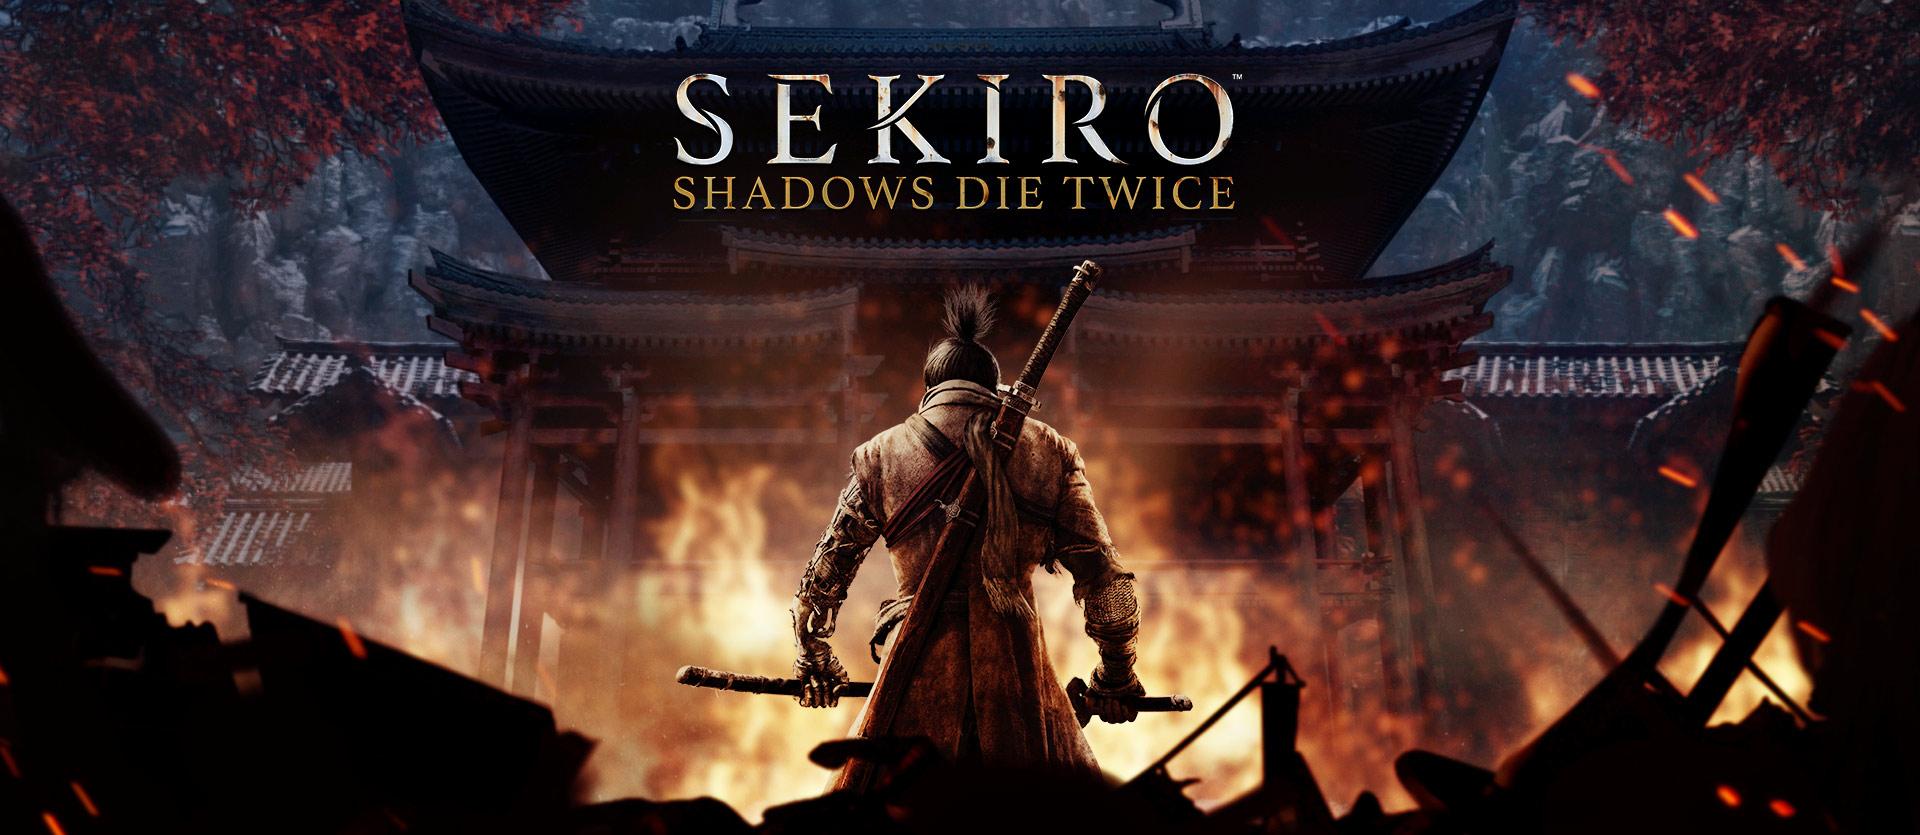 Sekiro: Shadows Die Twice Oyun İnceleme